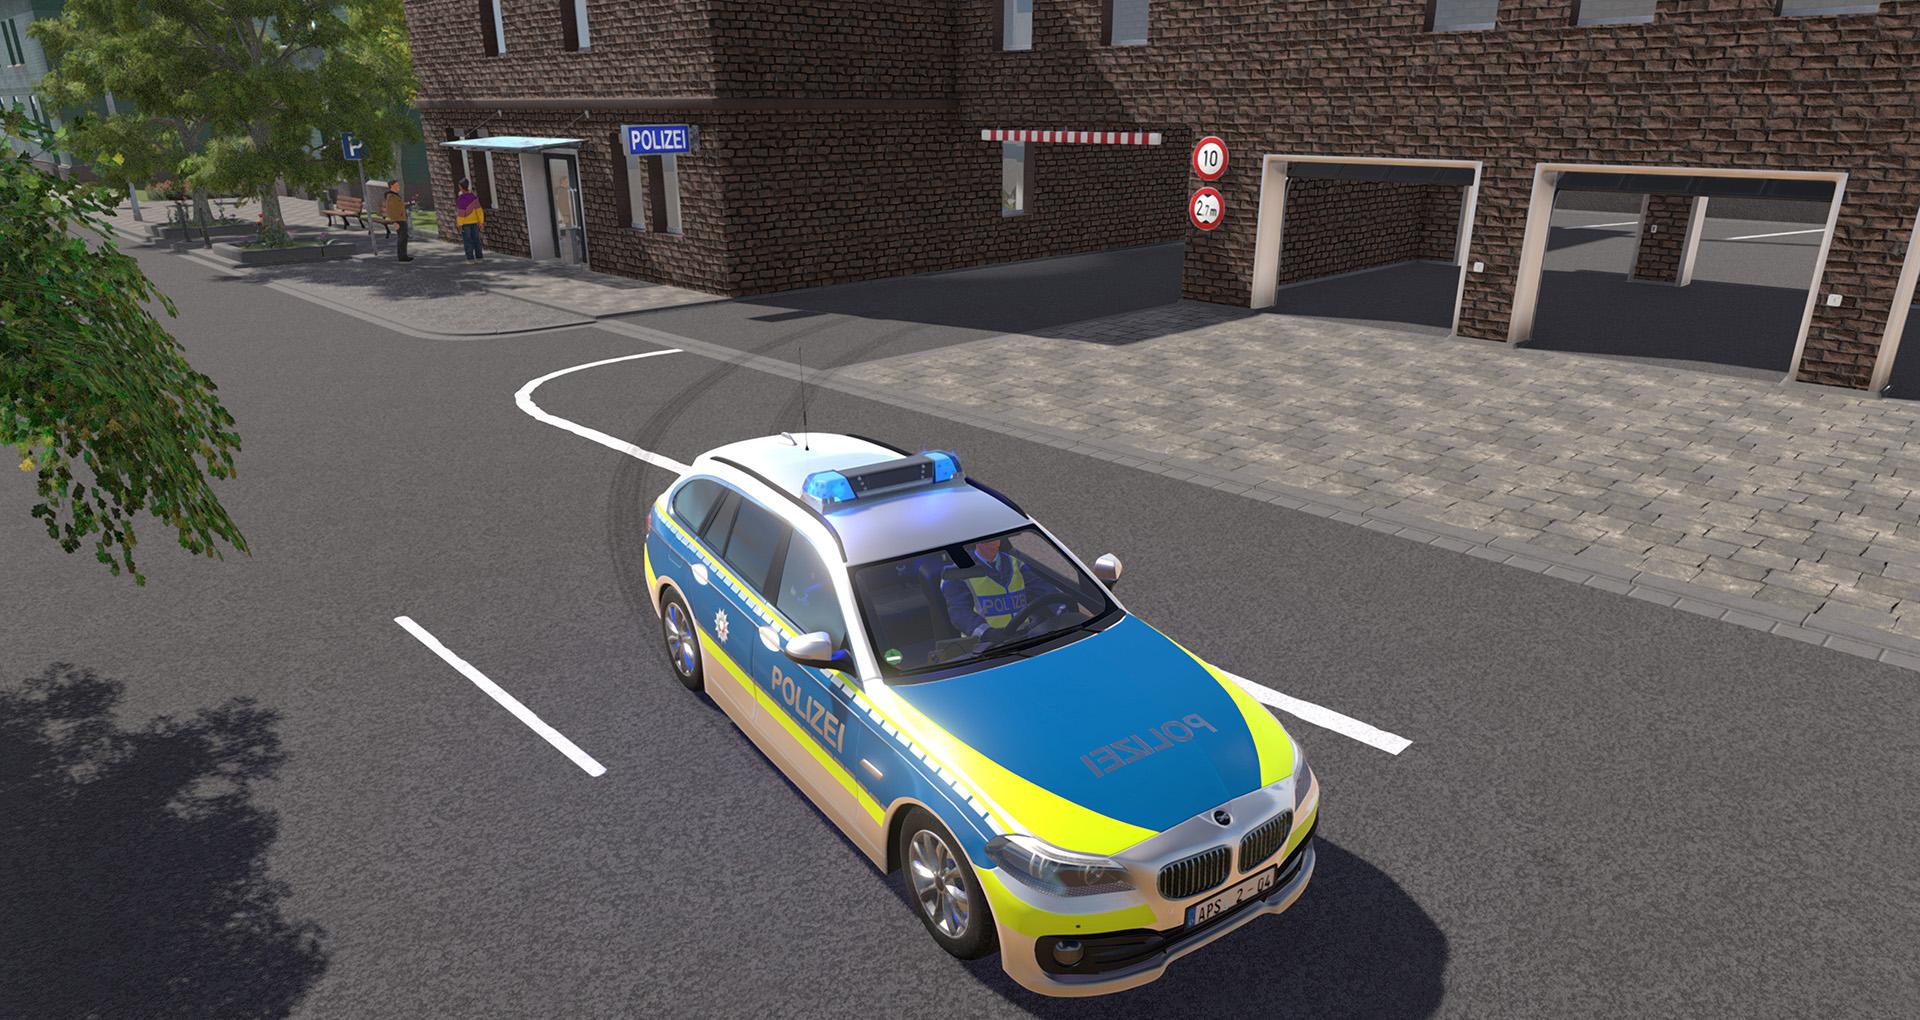 Autobahn Police Simulator 2 (2017/PC/Английский), Лицензия